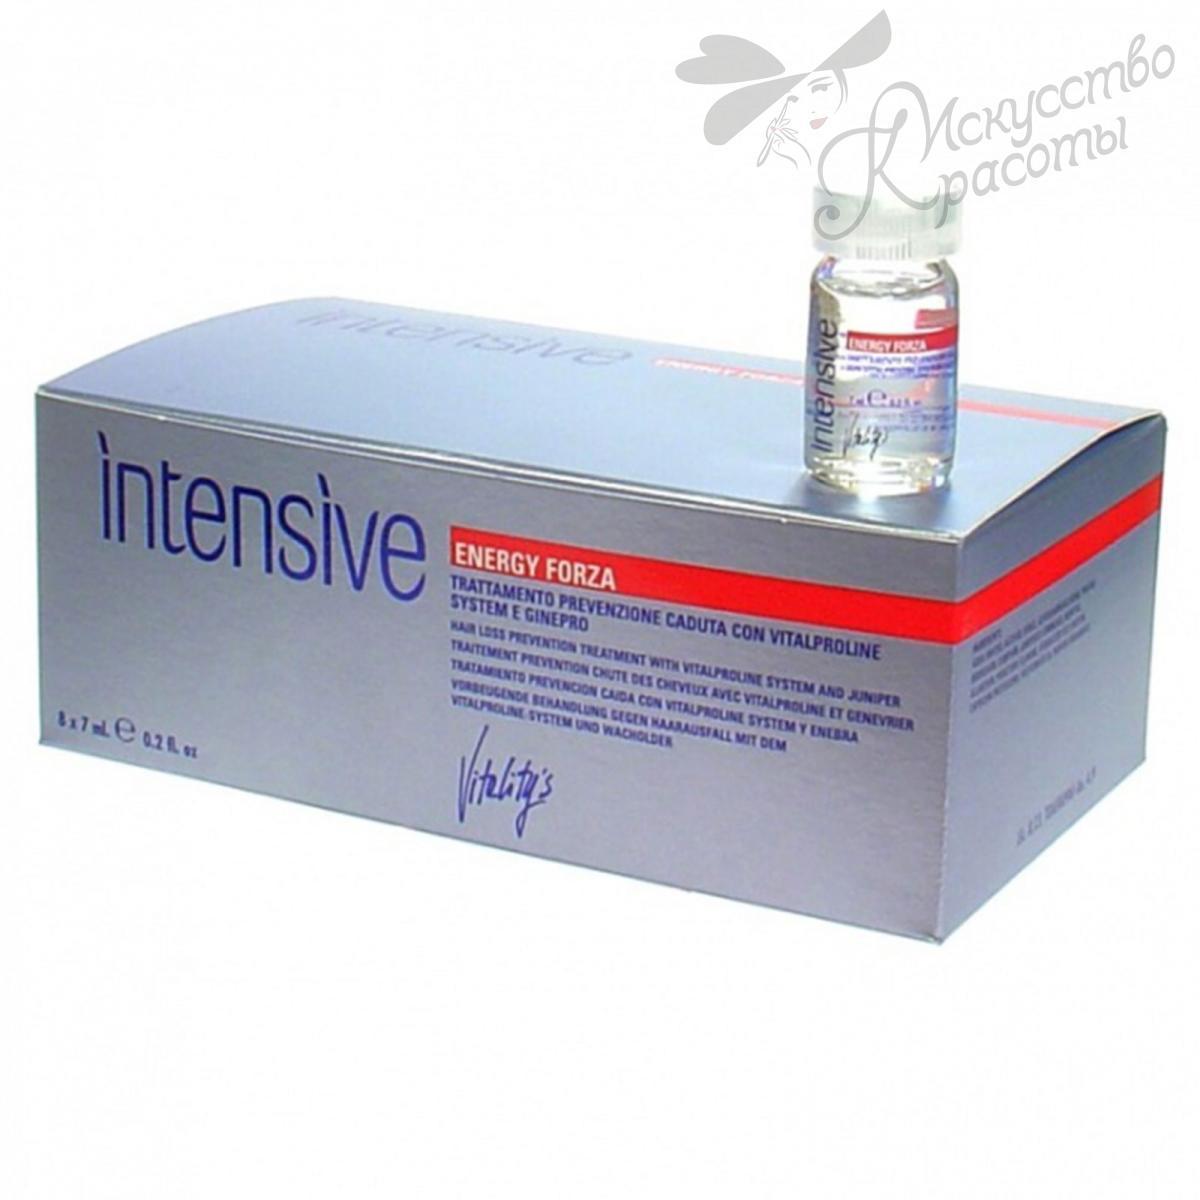 "Лосьон против выпадения Vitality's Intensive Energy Forza"".(8х7мл)"